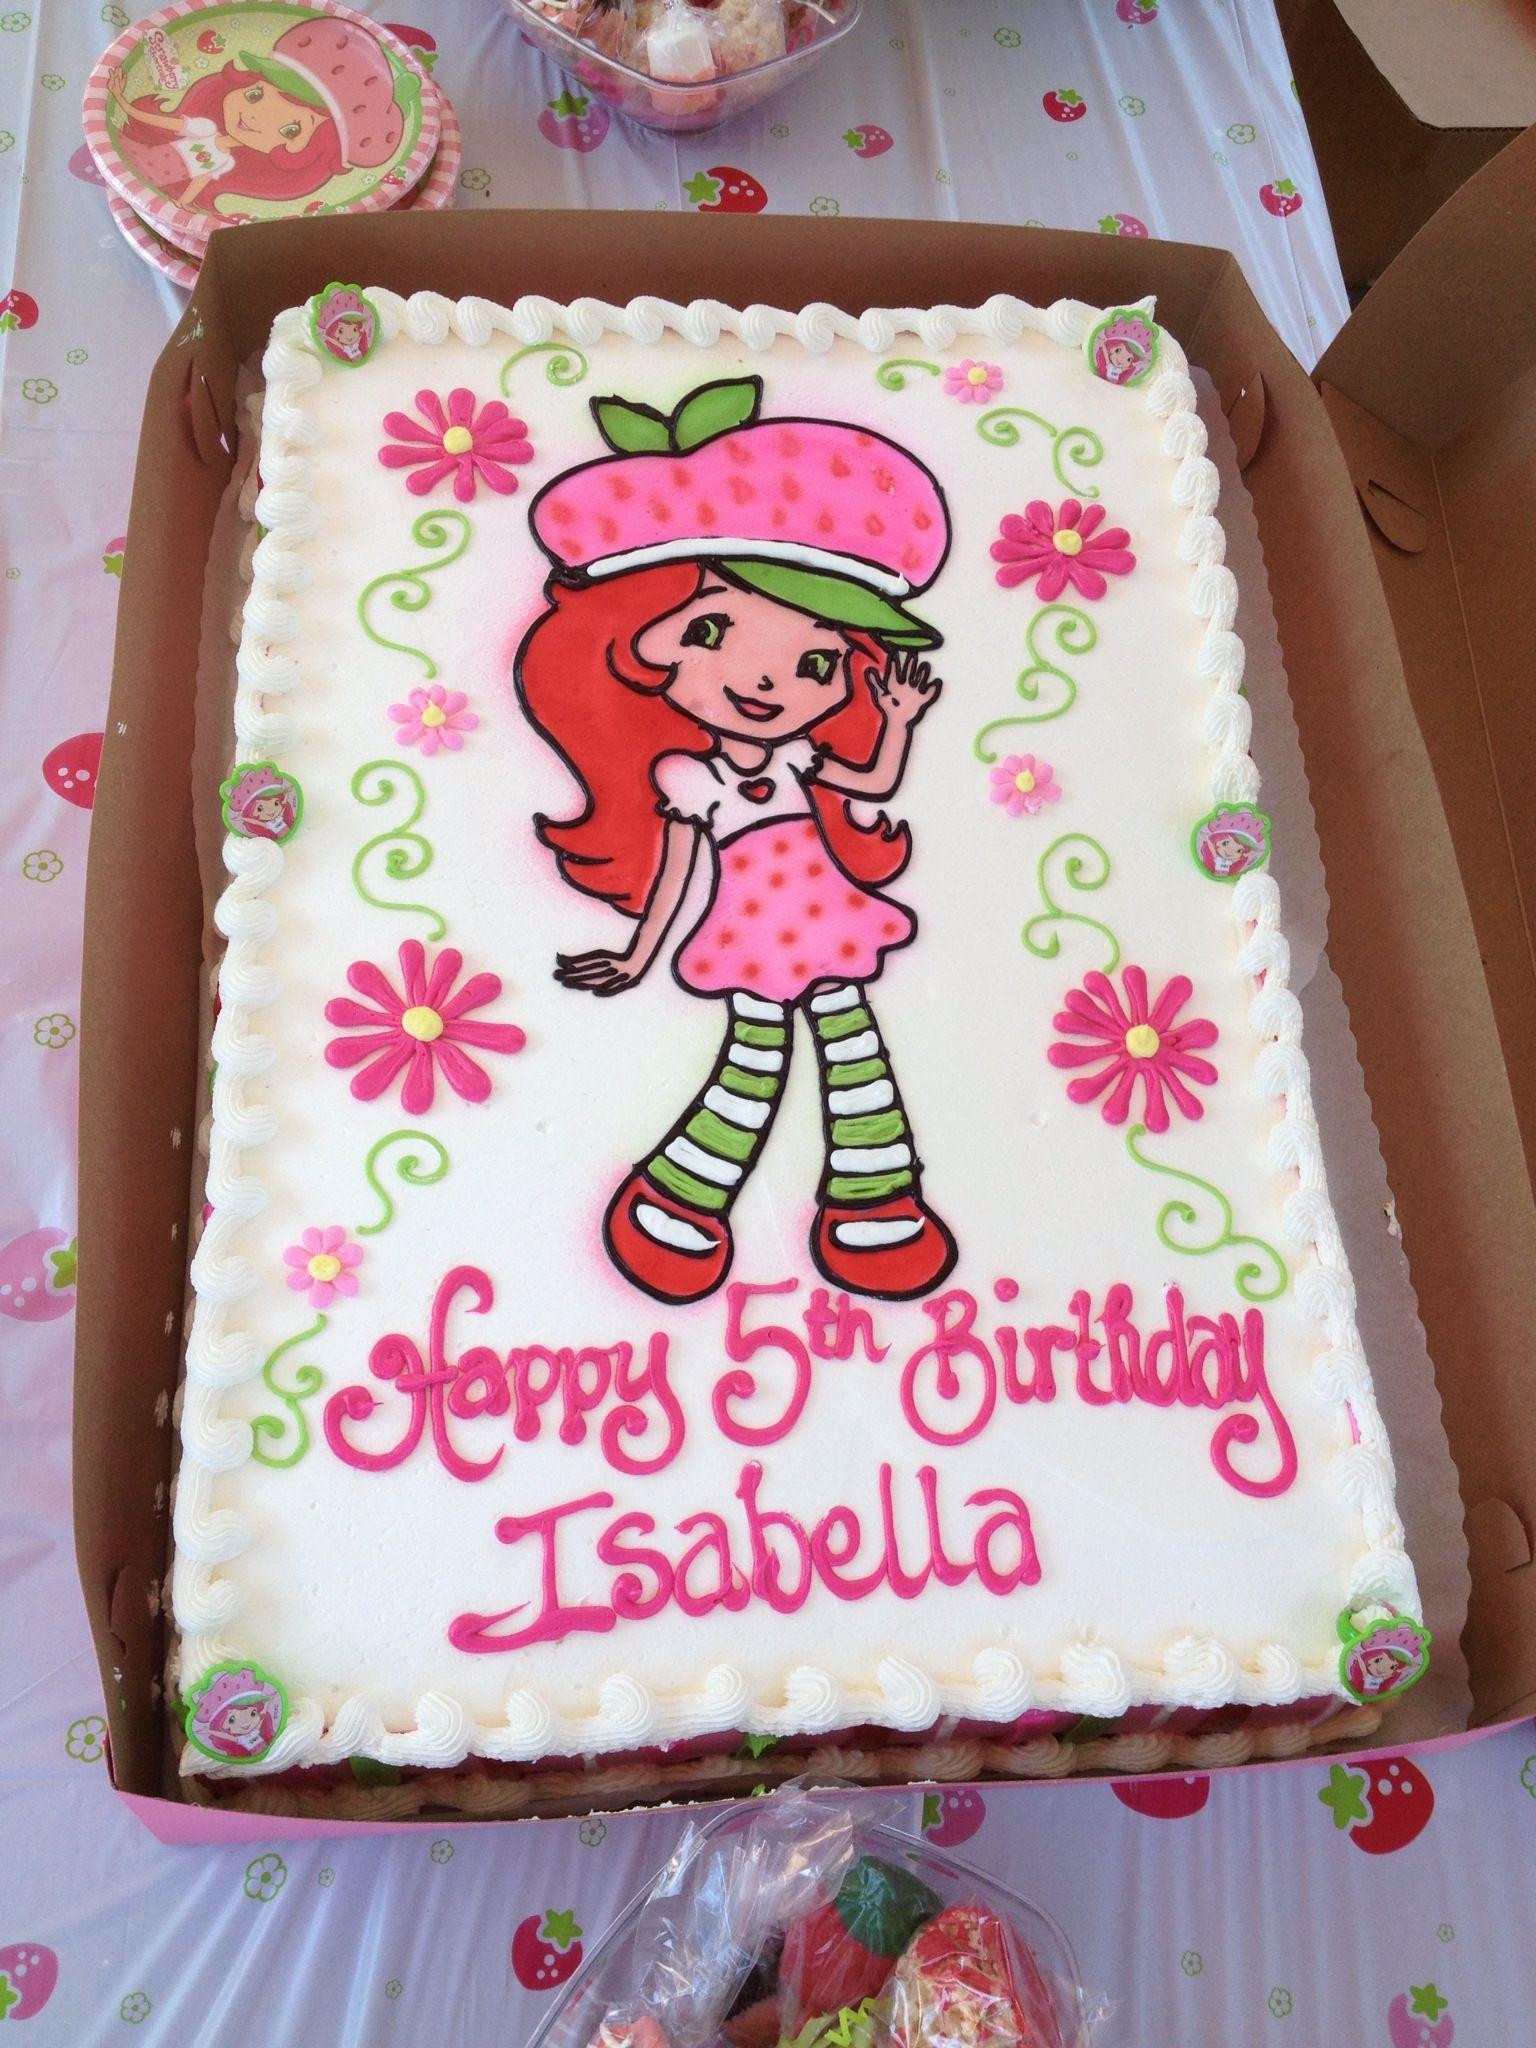 Strawberry Shortcake Birthday Cake By Ginas Piece Of Cake Santa